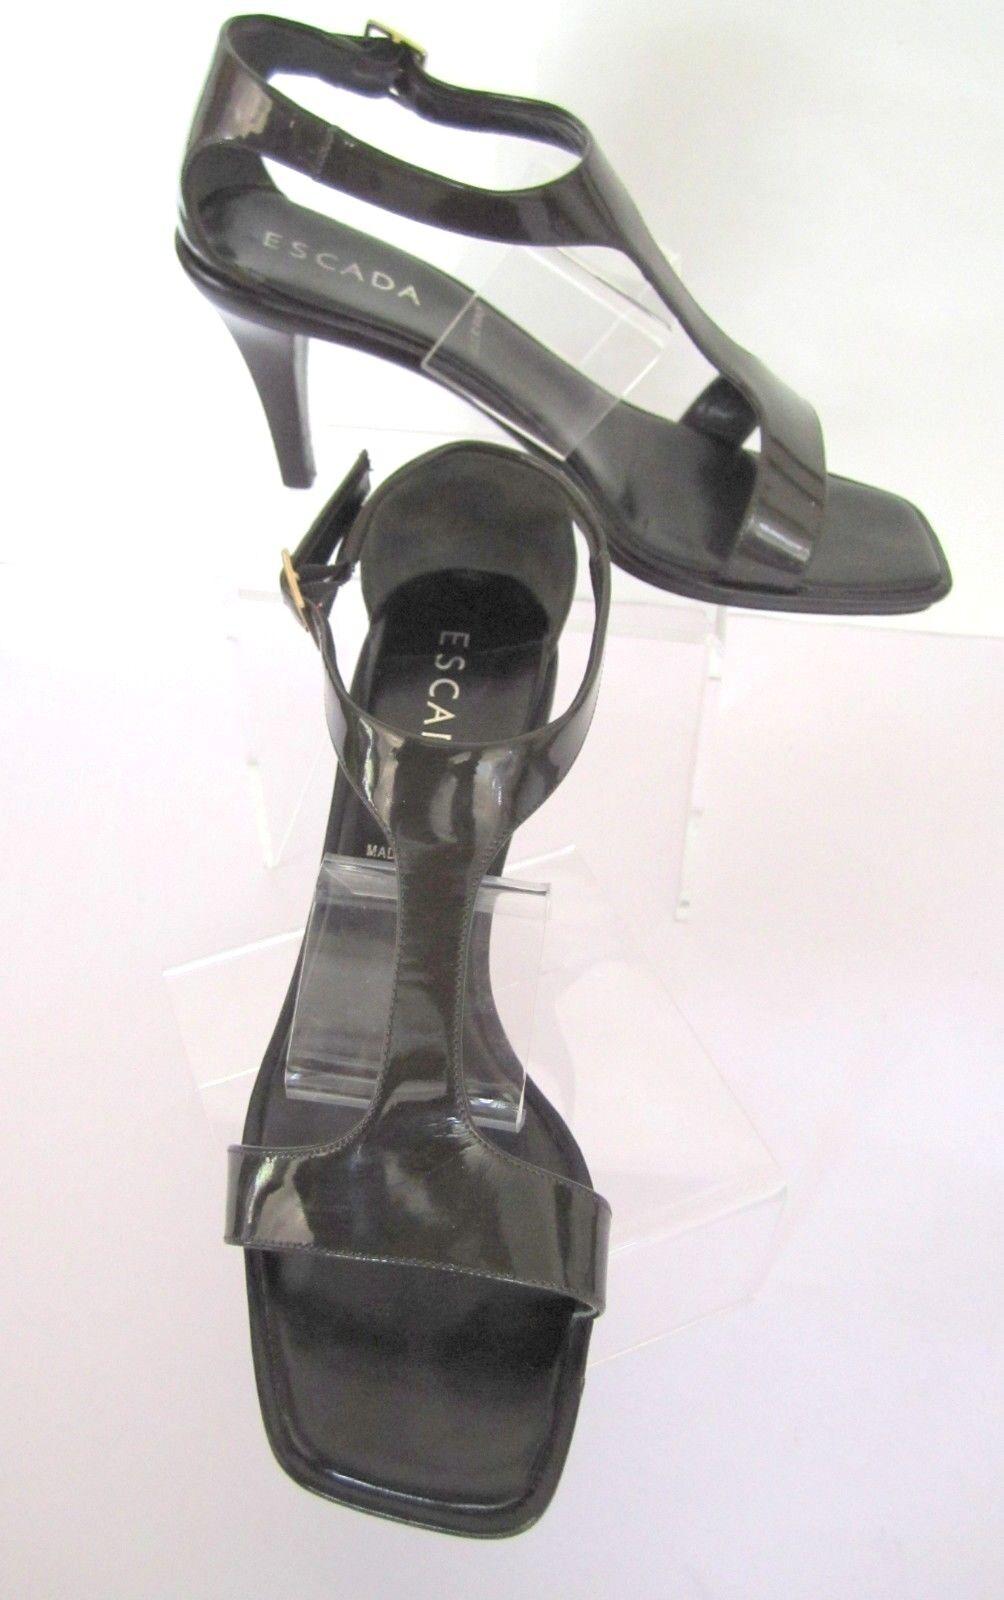 ESCADA Charcoal Patent Patent Patent T-Strap Stacked Heels Pumps Größe 8 EU 38 b95bf8